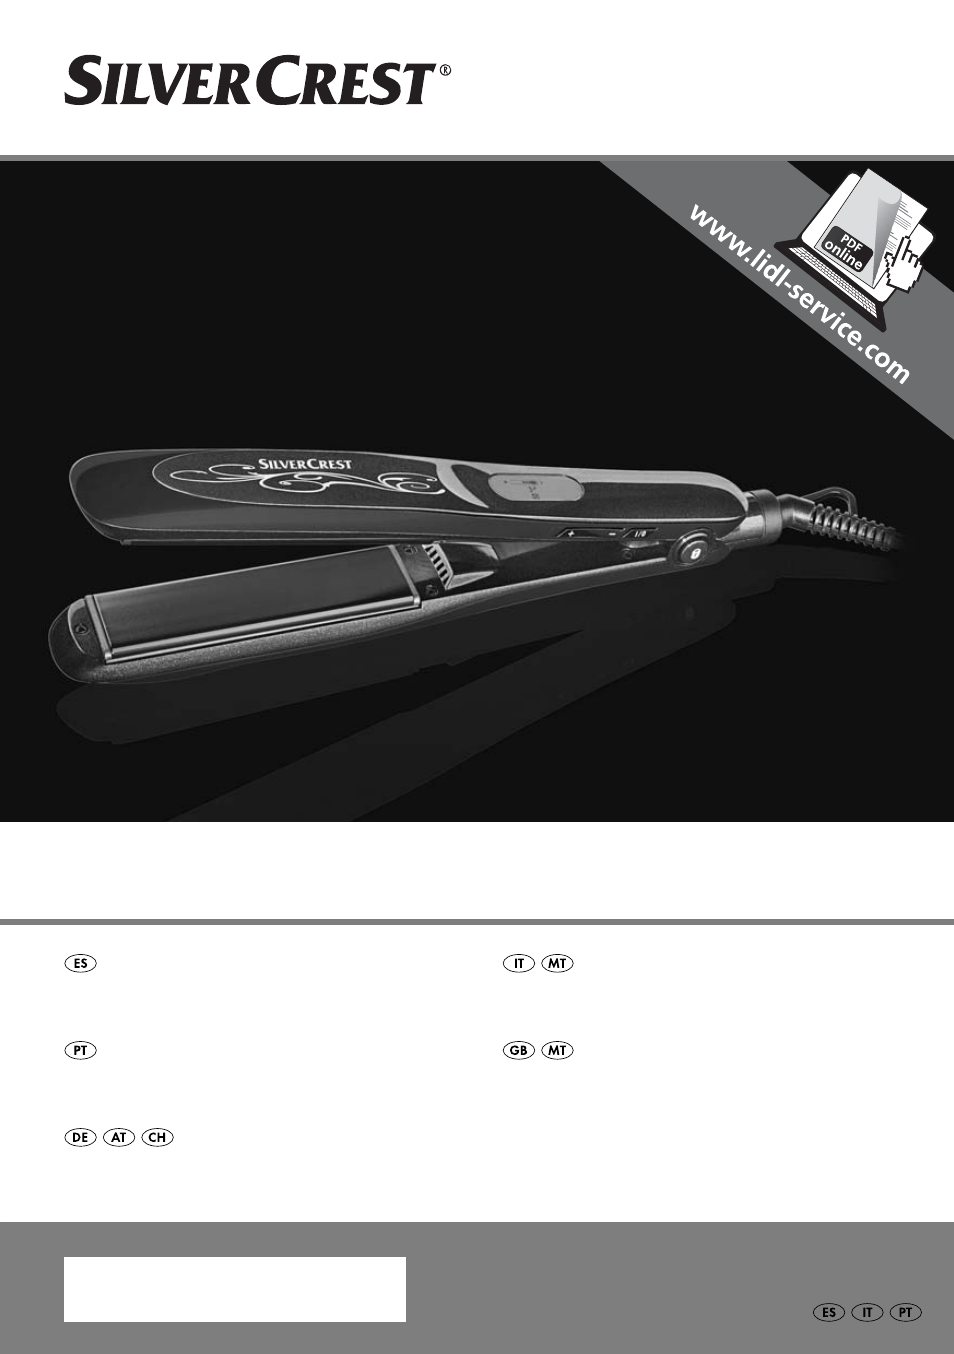 Silvercrest Shgd 40 C1 User Manual 63 Pages